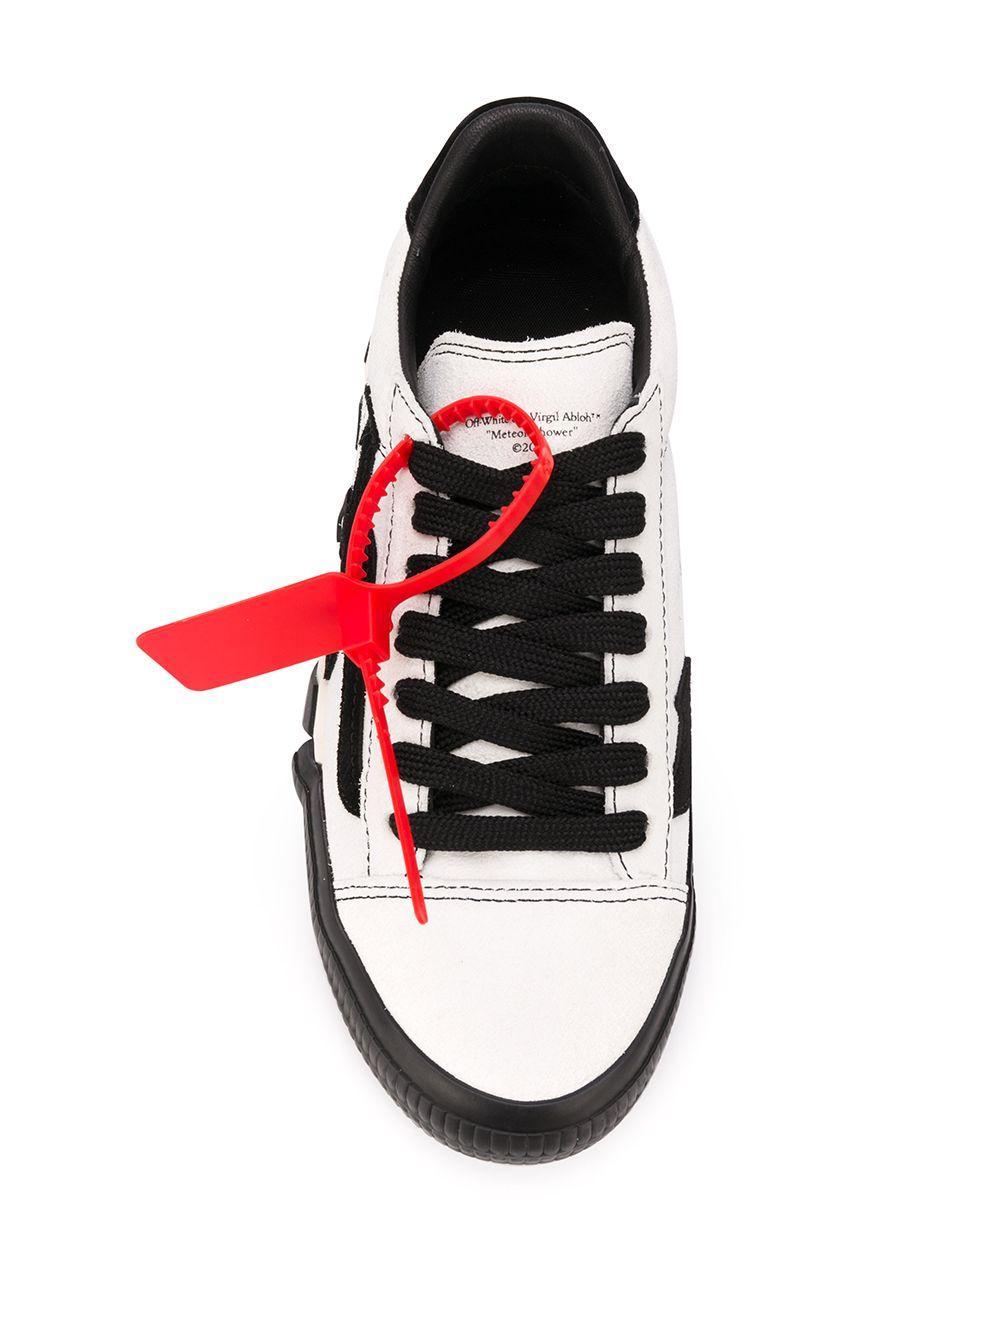 Zapatillas bajas Vulcanized Off-White c/o Virgil Abloh de Caucho de color Blanco